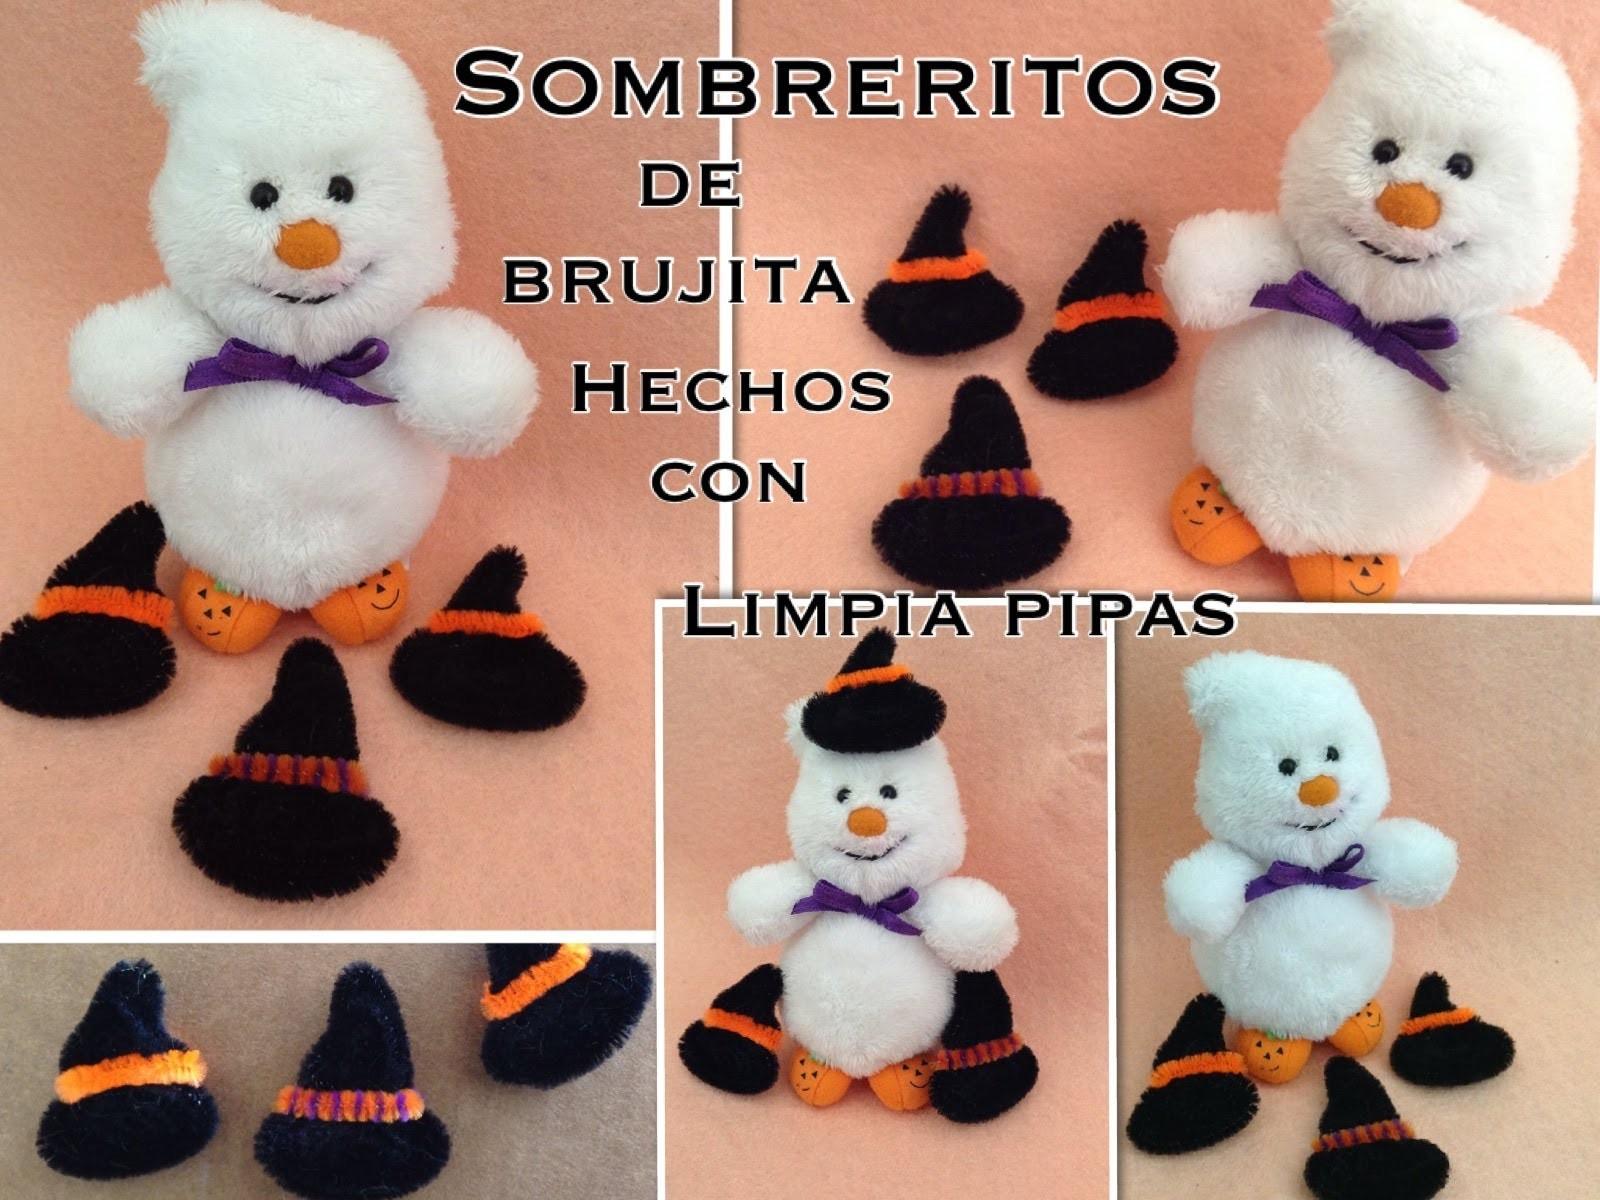 SOMBRERITOS DE BRUJA HECHOS CON LIMPIA PIPAS PARA  HALLOWEEN.- PIPE CLEANER WITCH HATS .